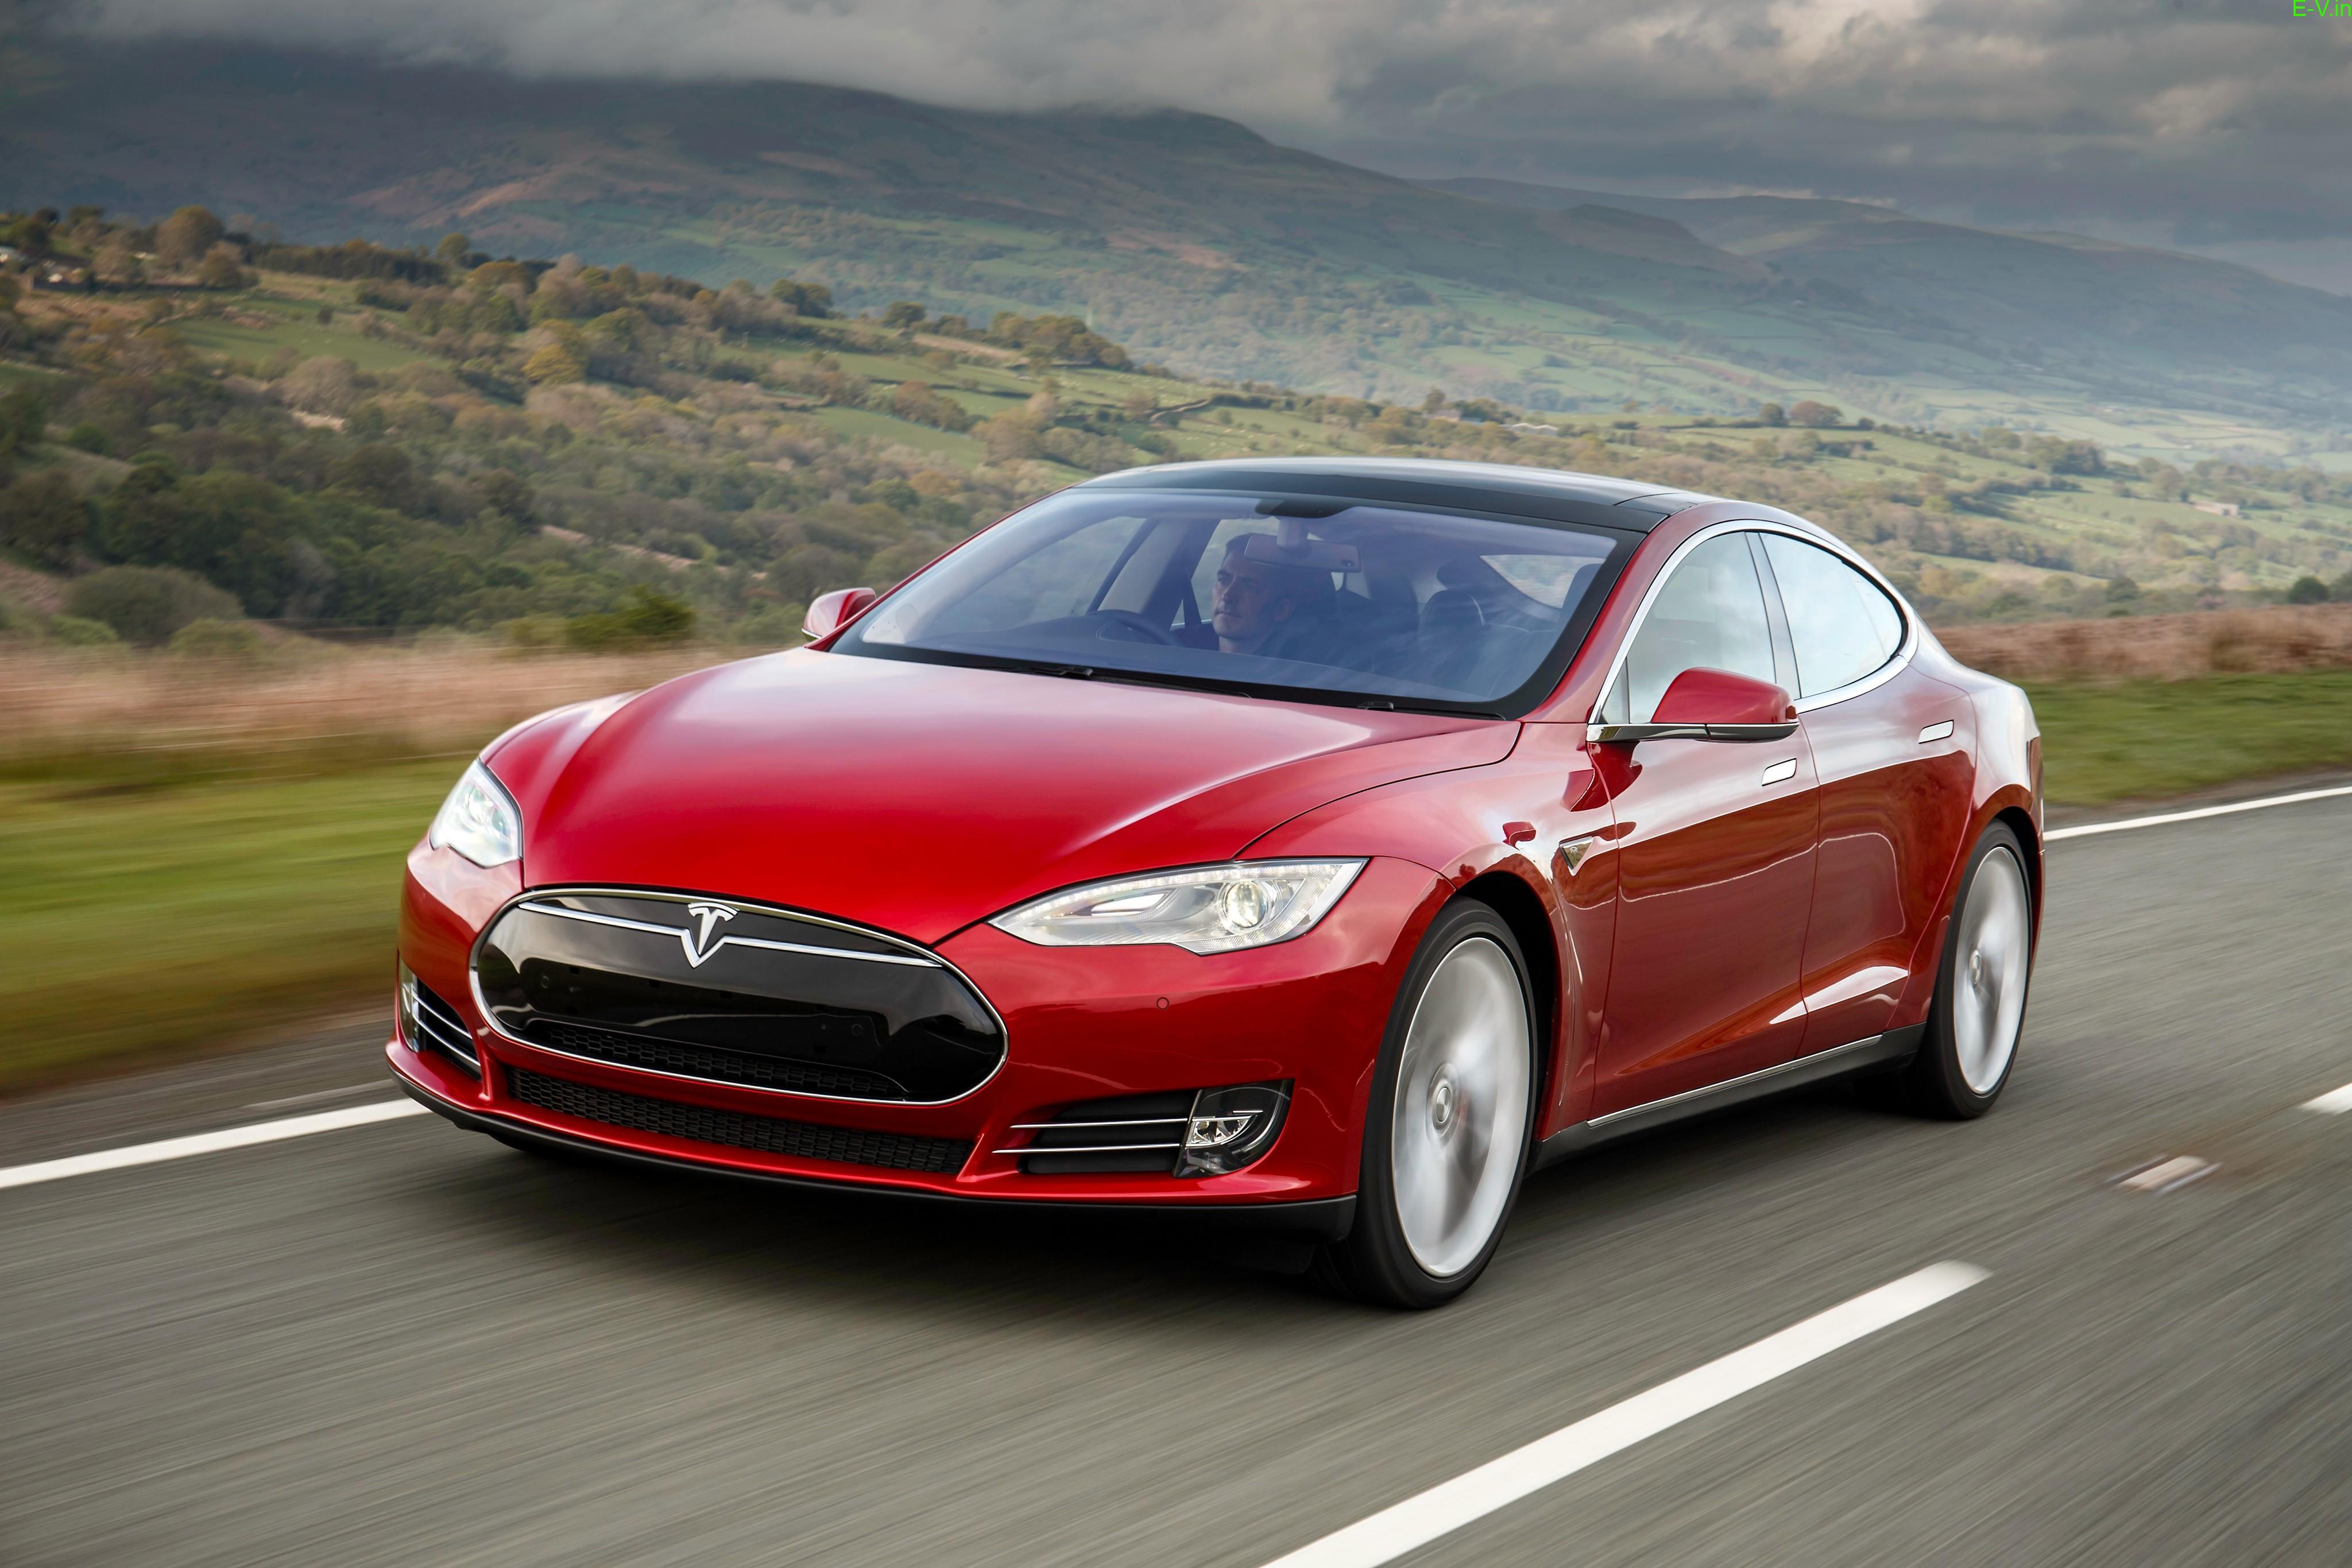 Hybrid vs Electric vehicles